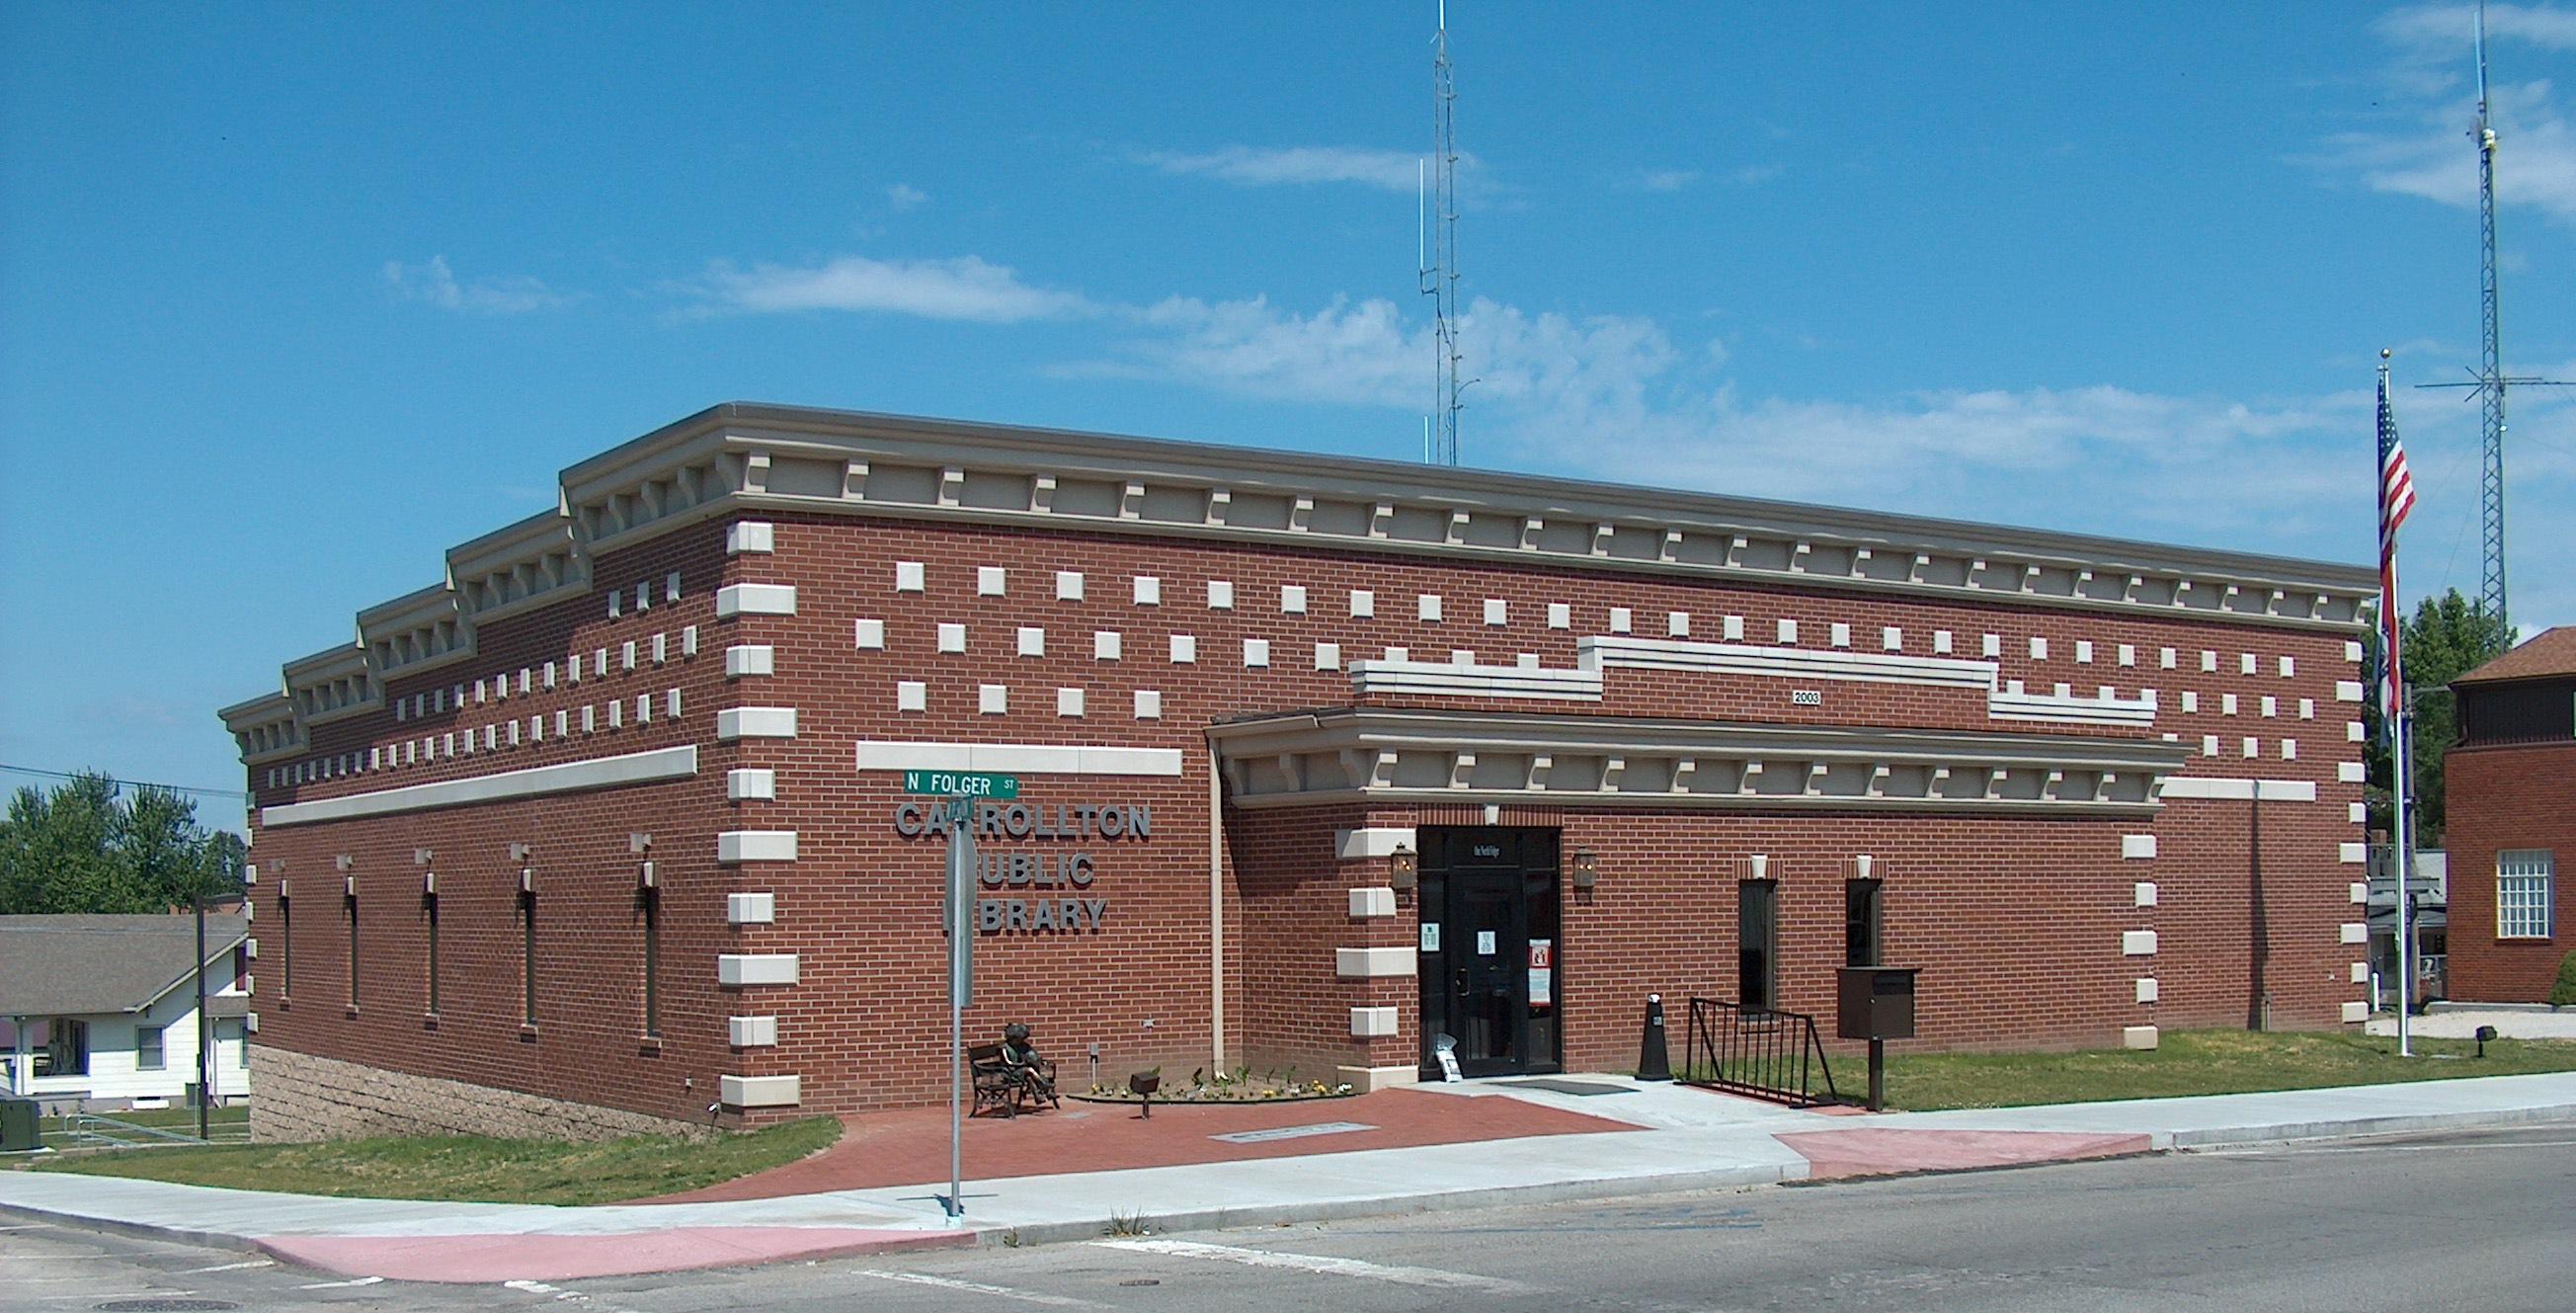 Technology grant awarded to Carrollton Public Library